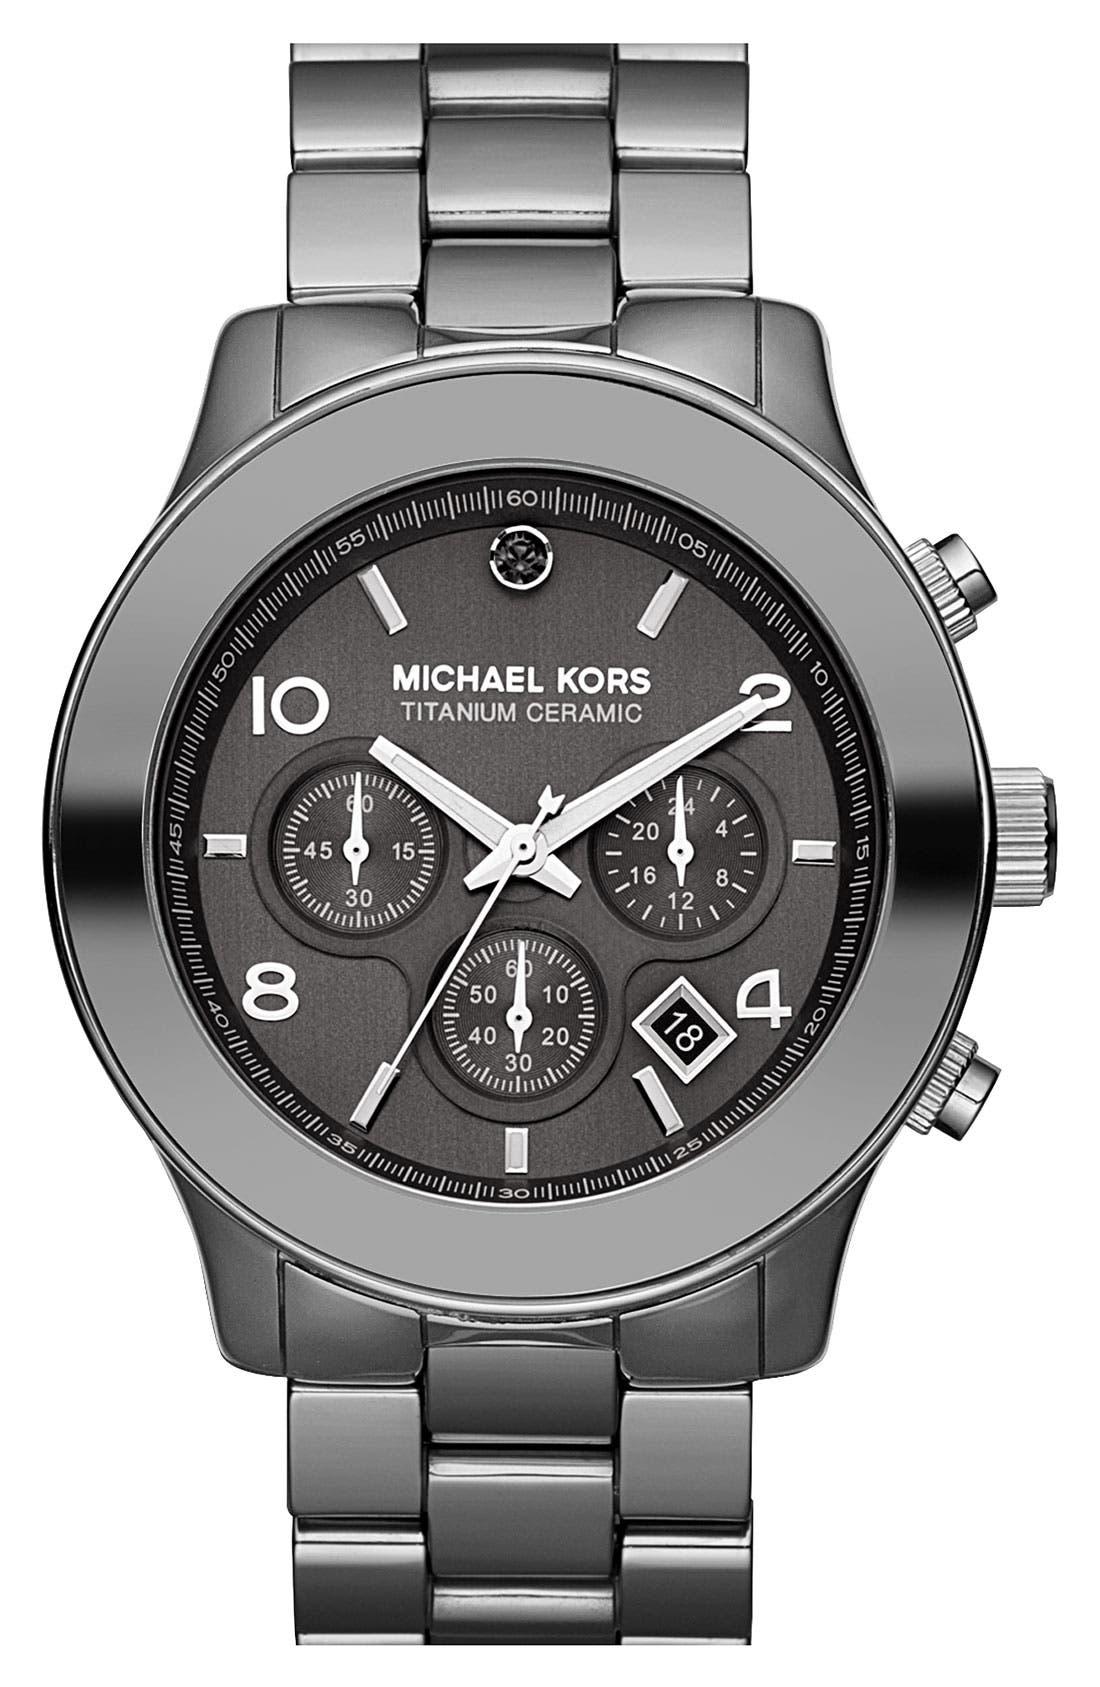 Main Image - Michael Kors 'Runway' Titanium Ceramic Bracelet Watch